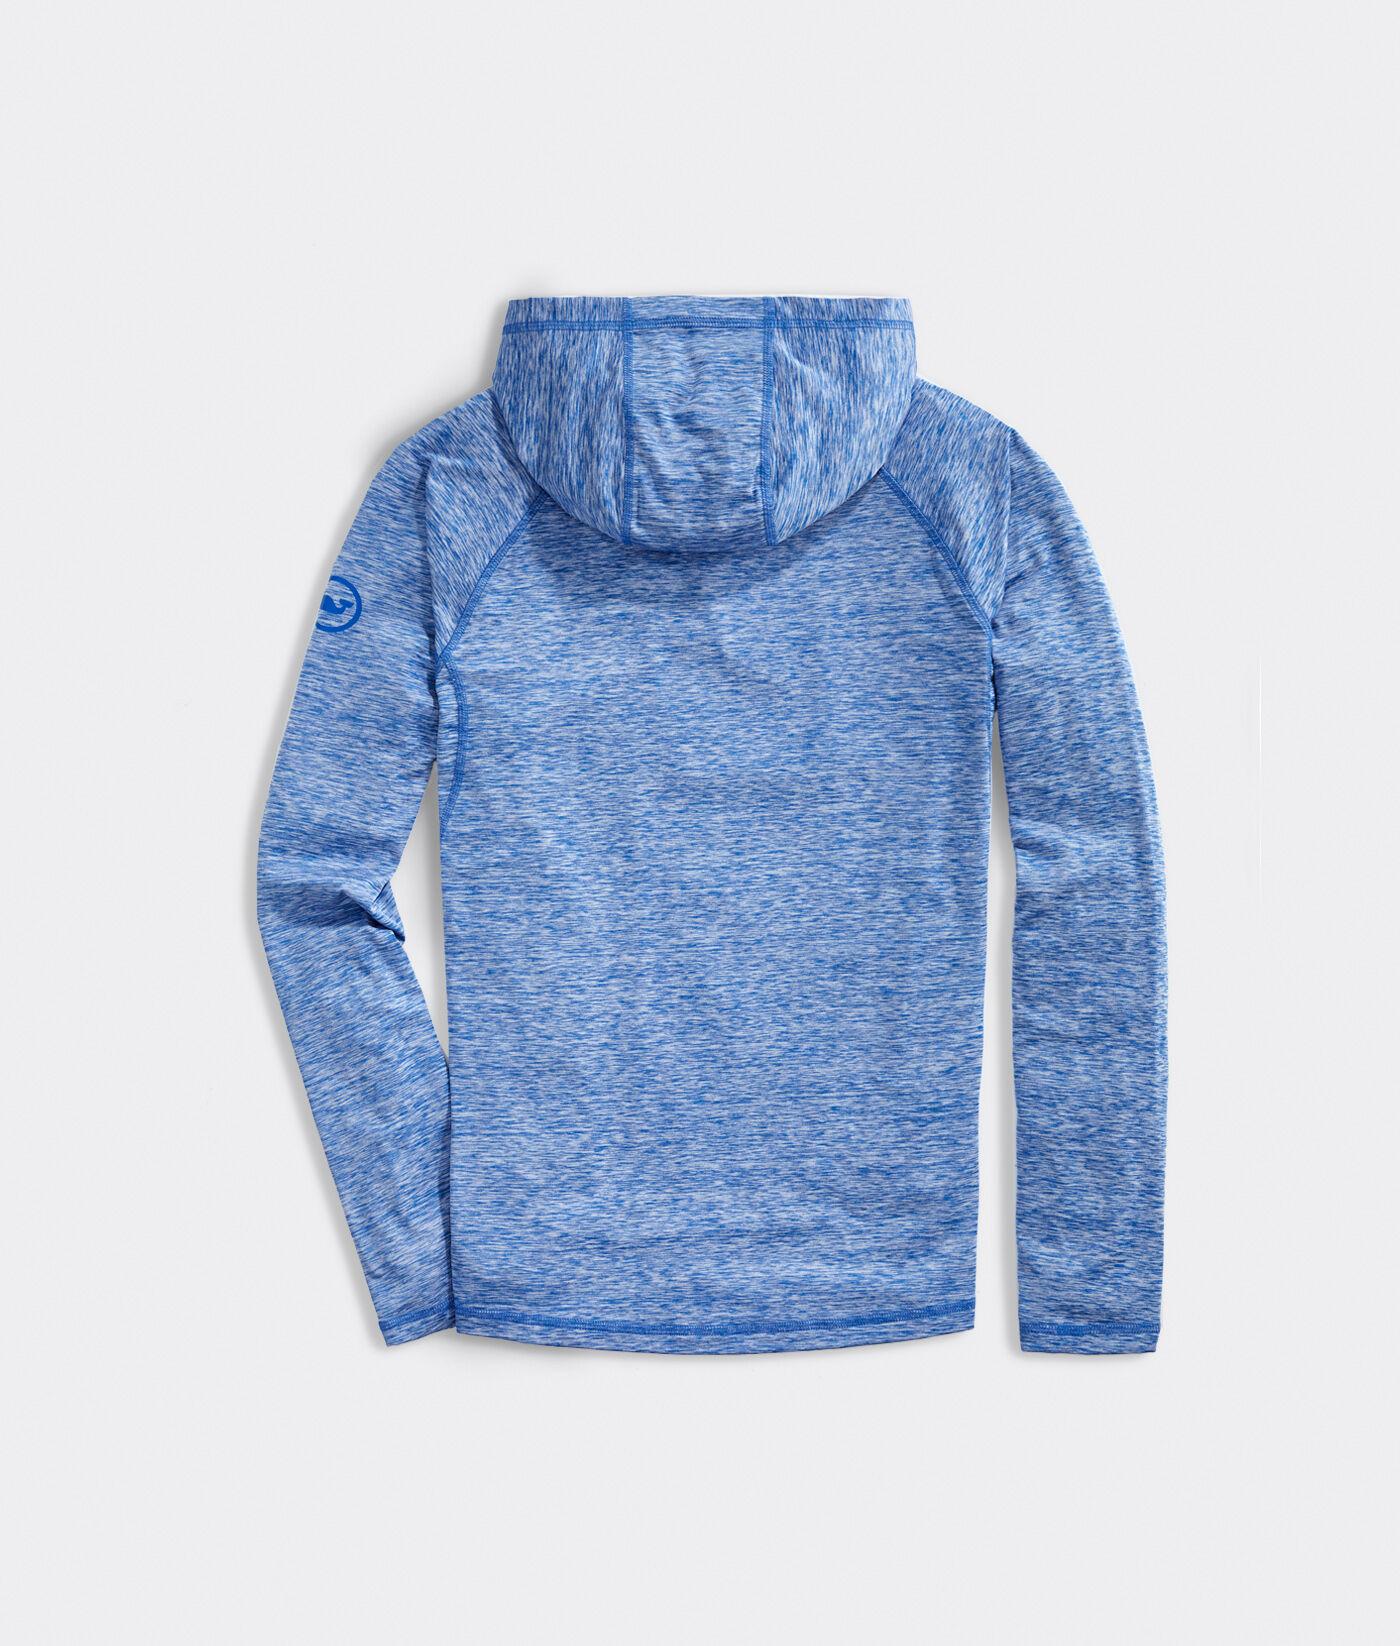 Hoody Fishing Crewneck Sweatshirt Jumping Sport for Men or Women